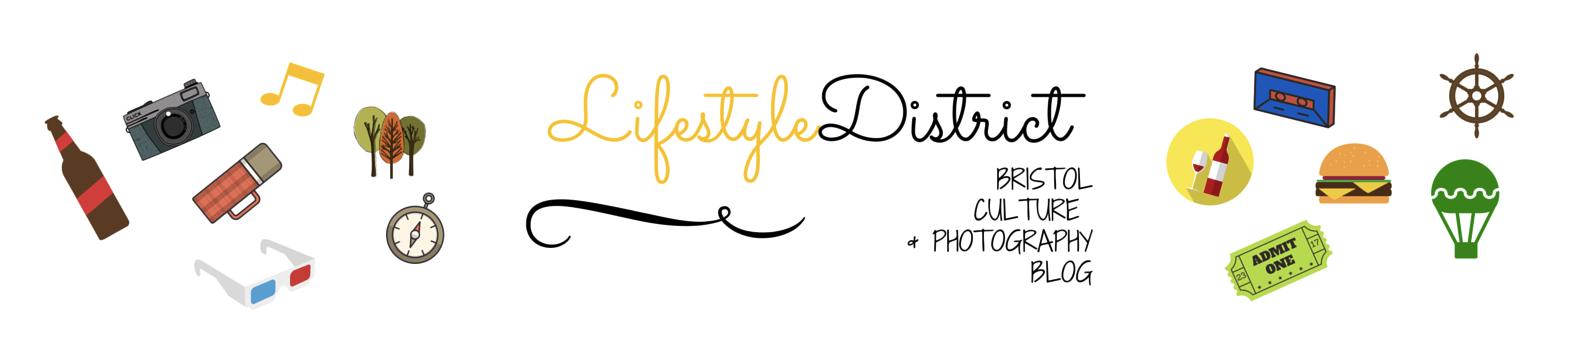 Lifestyle District | Bristol culture & photography blog